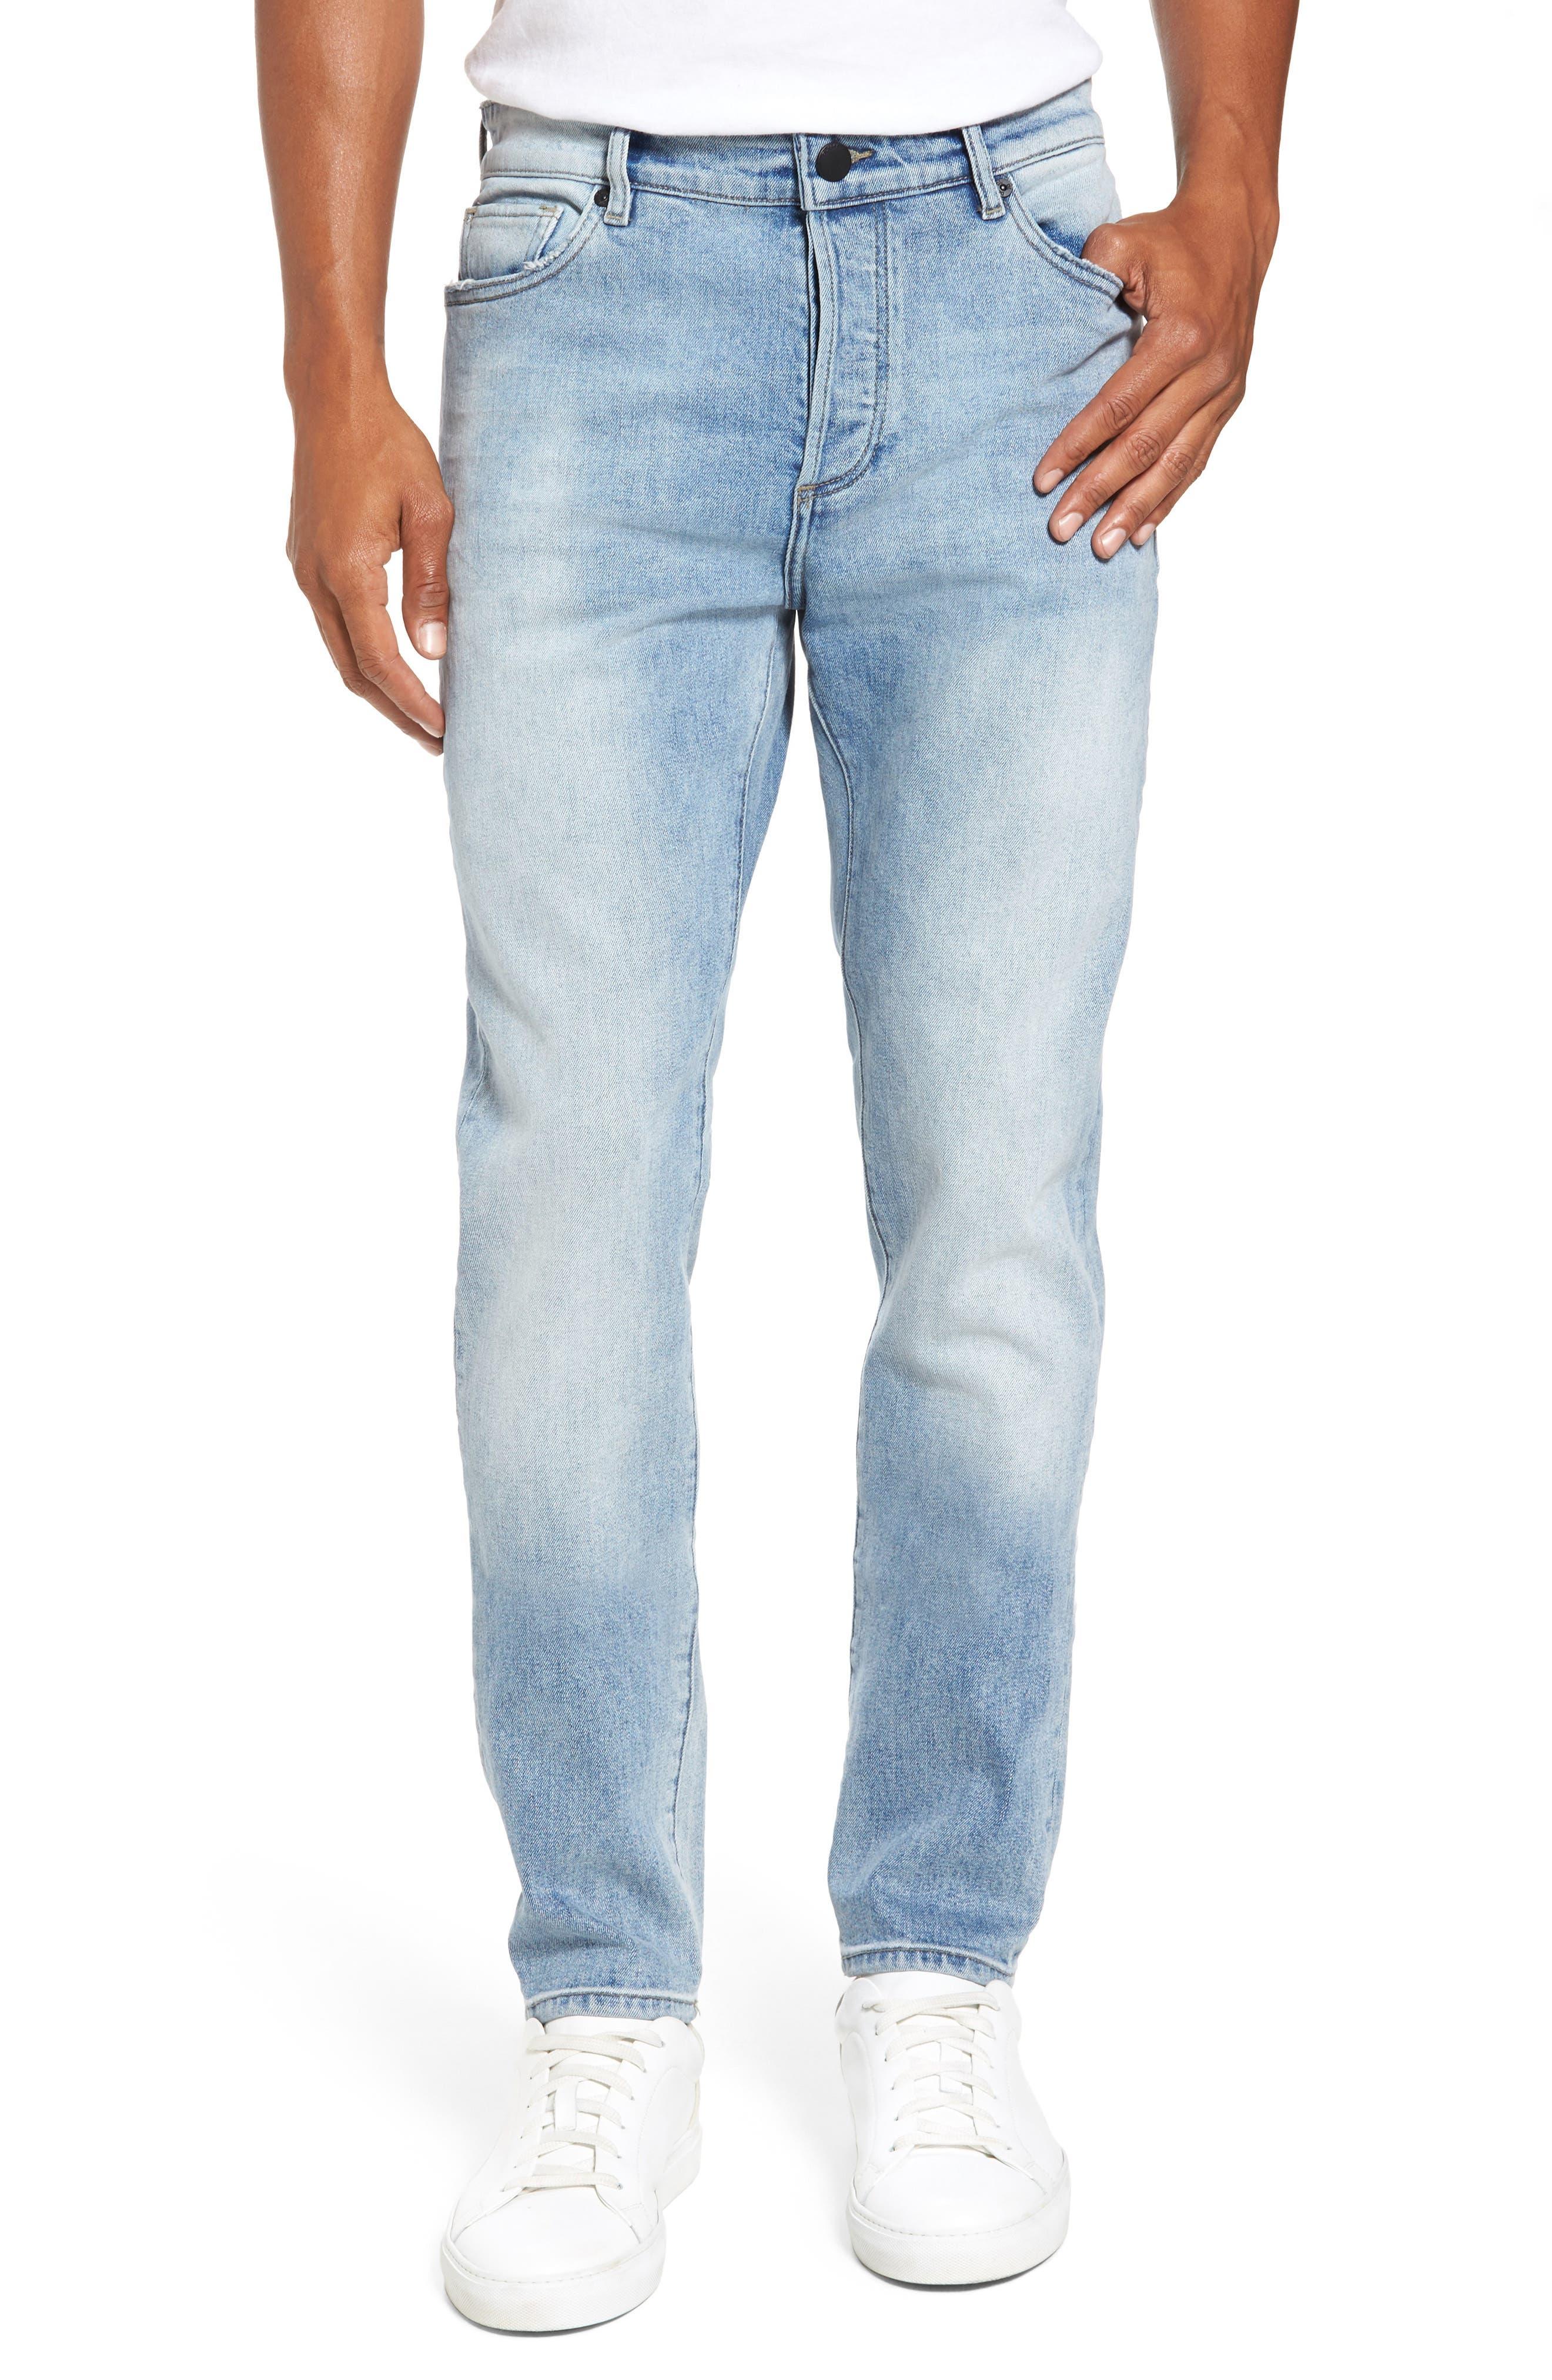 DL1961 Cooper Slouchy Skinny Jeans (Sleet)